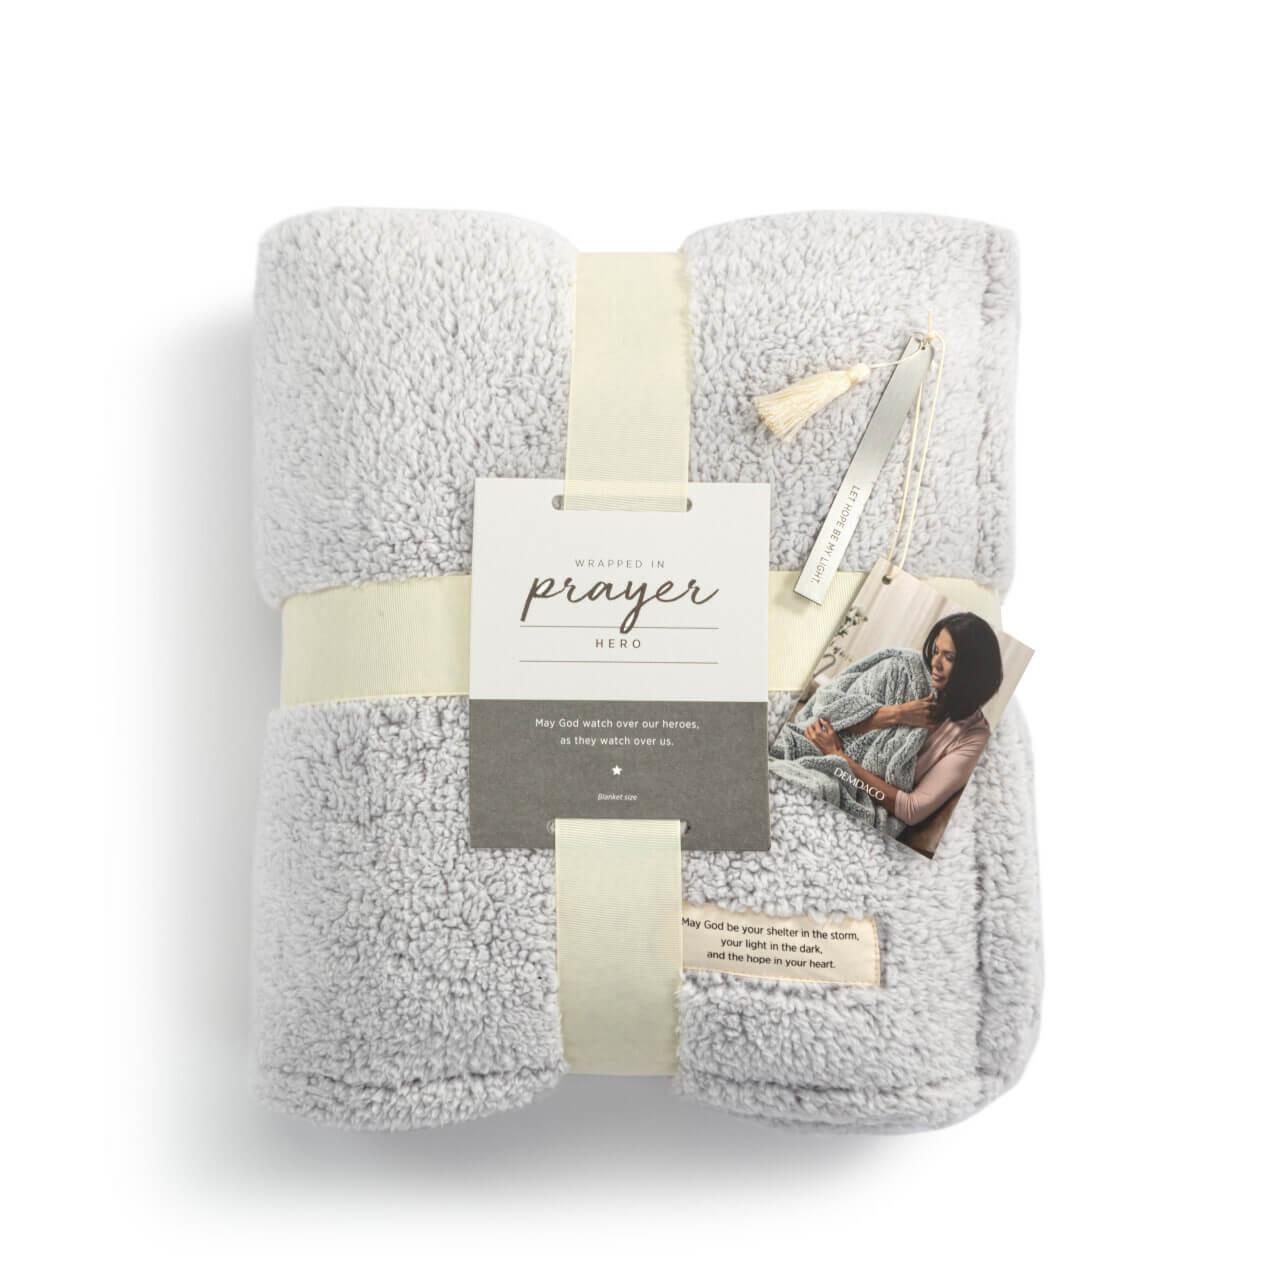 Demdaco hope healing light plush prayer blanket